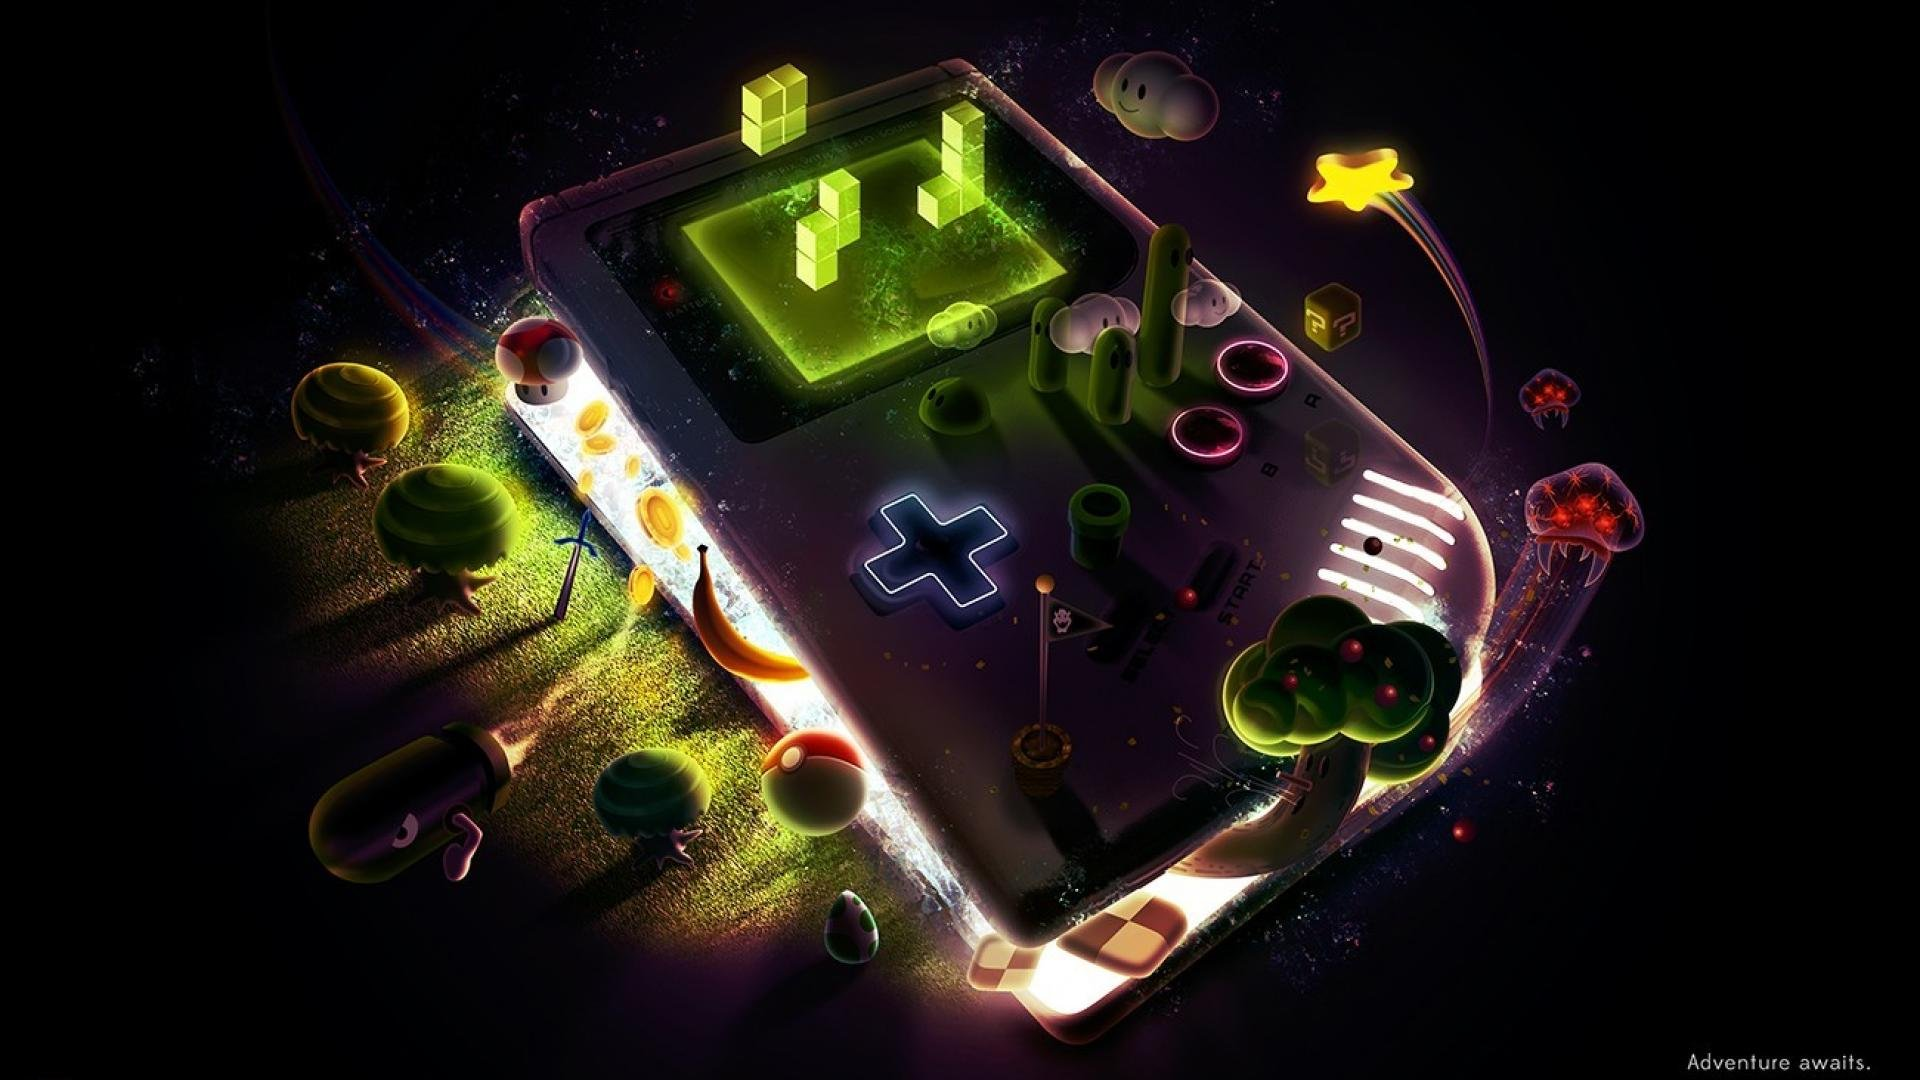 Retro Gaming desktop wallpaper download